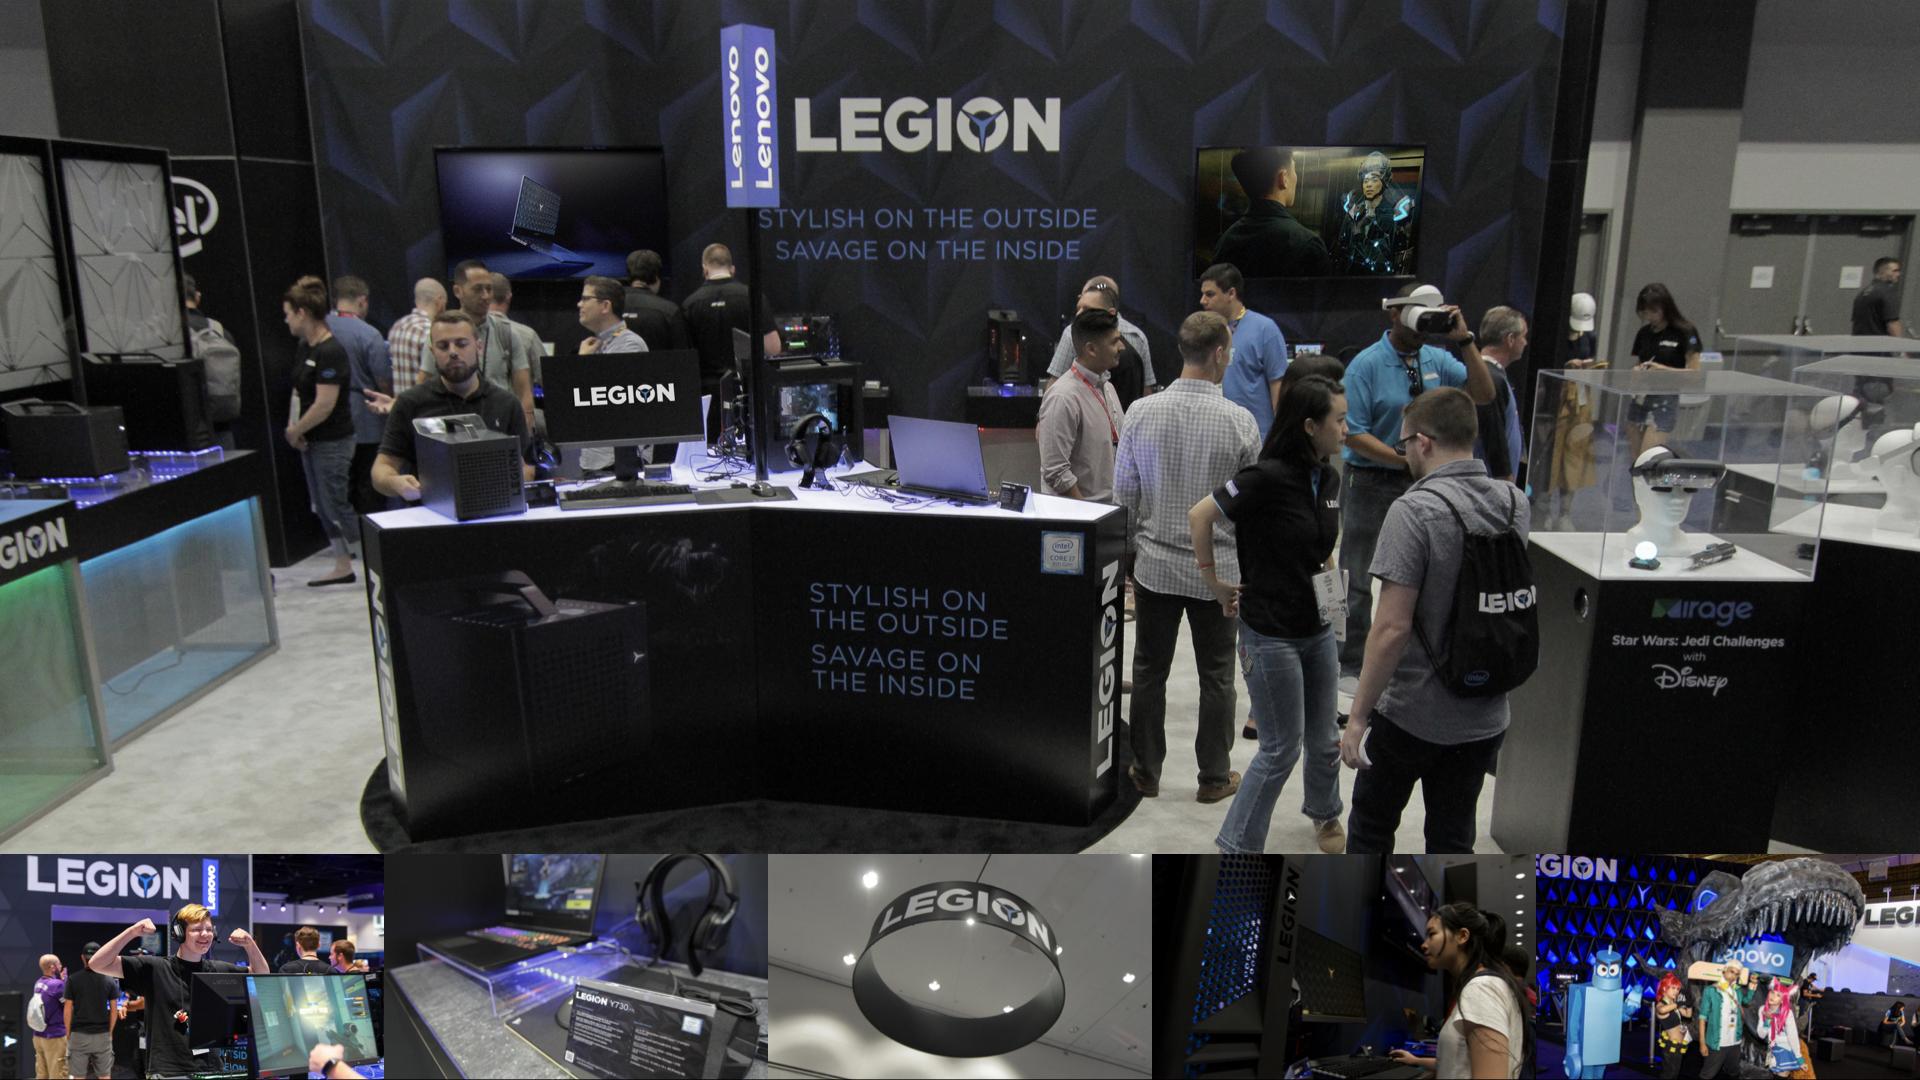 Legion-Assets.002.jpeg